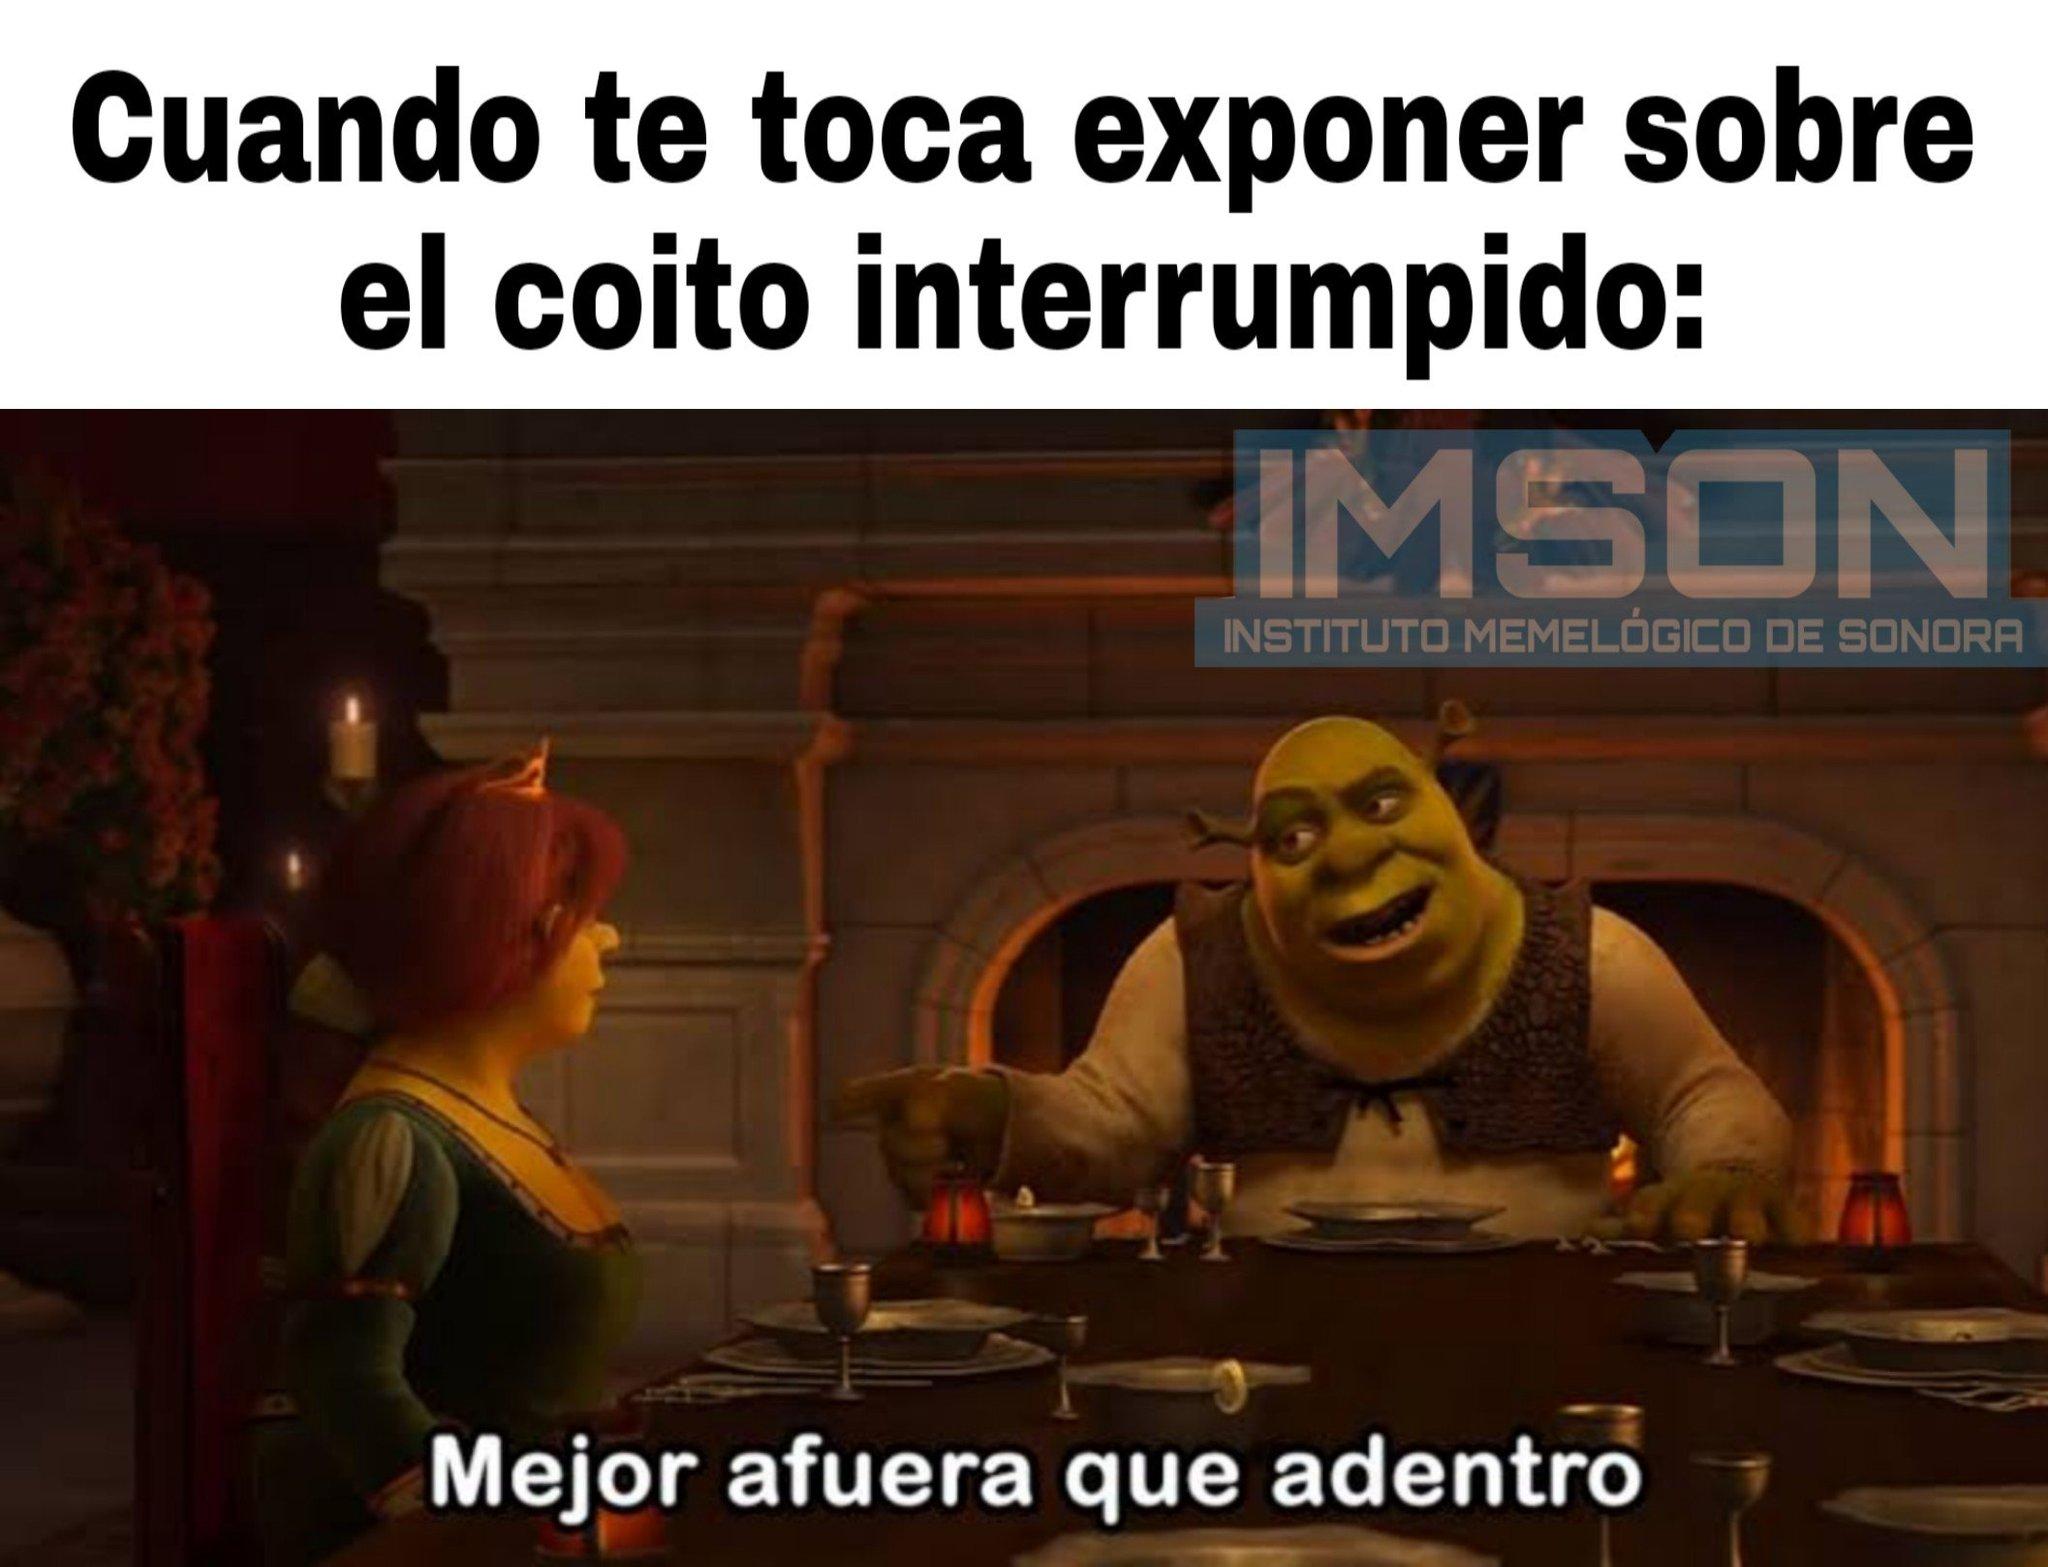 Shrek no aplicó su frase - meme